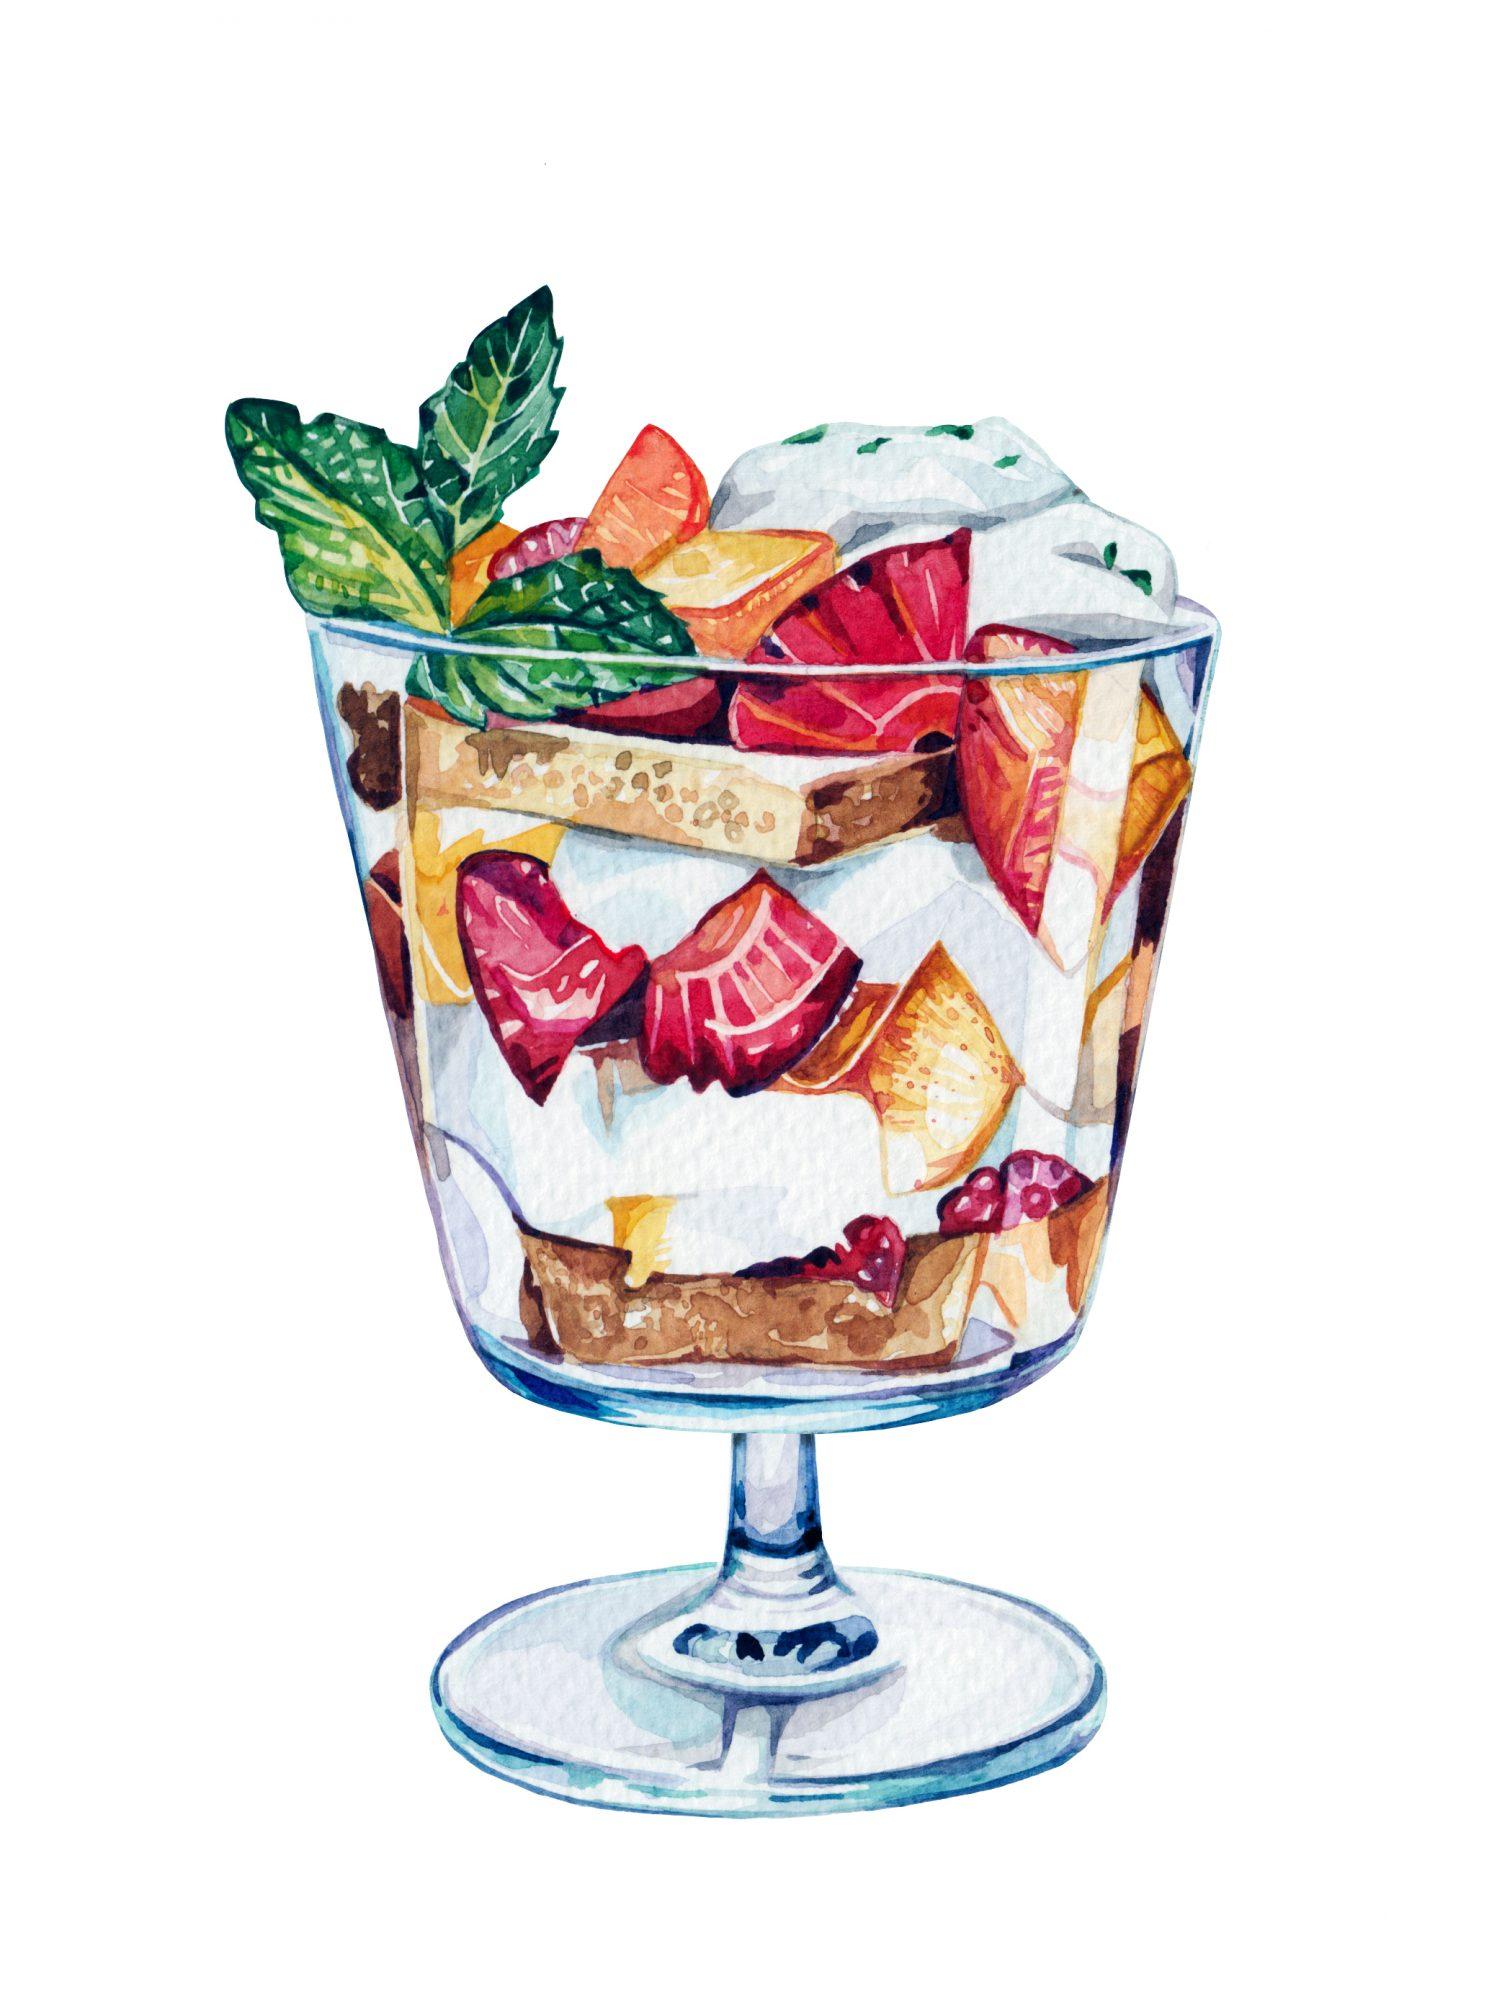 Strawberry-Peach Parfaits